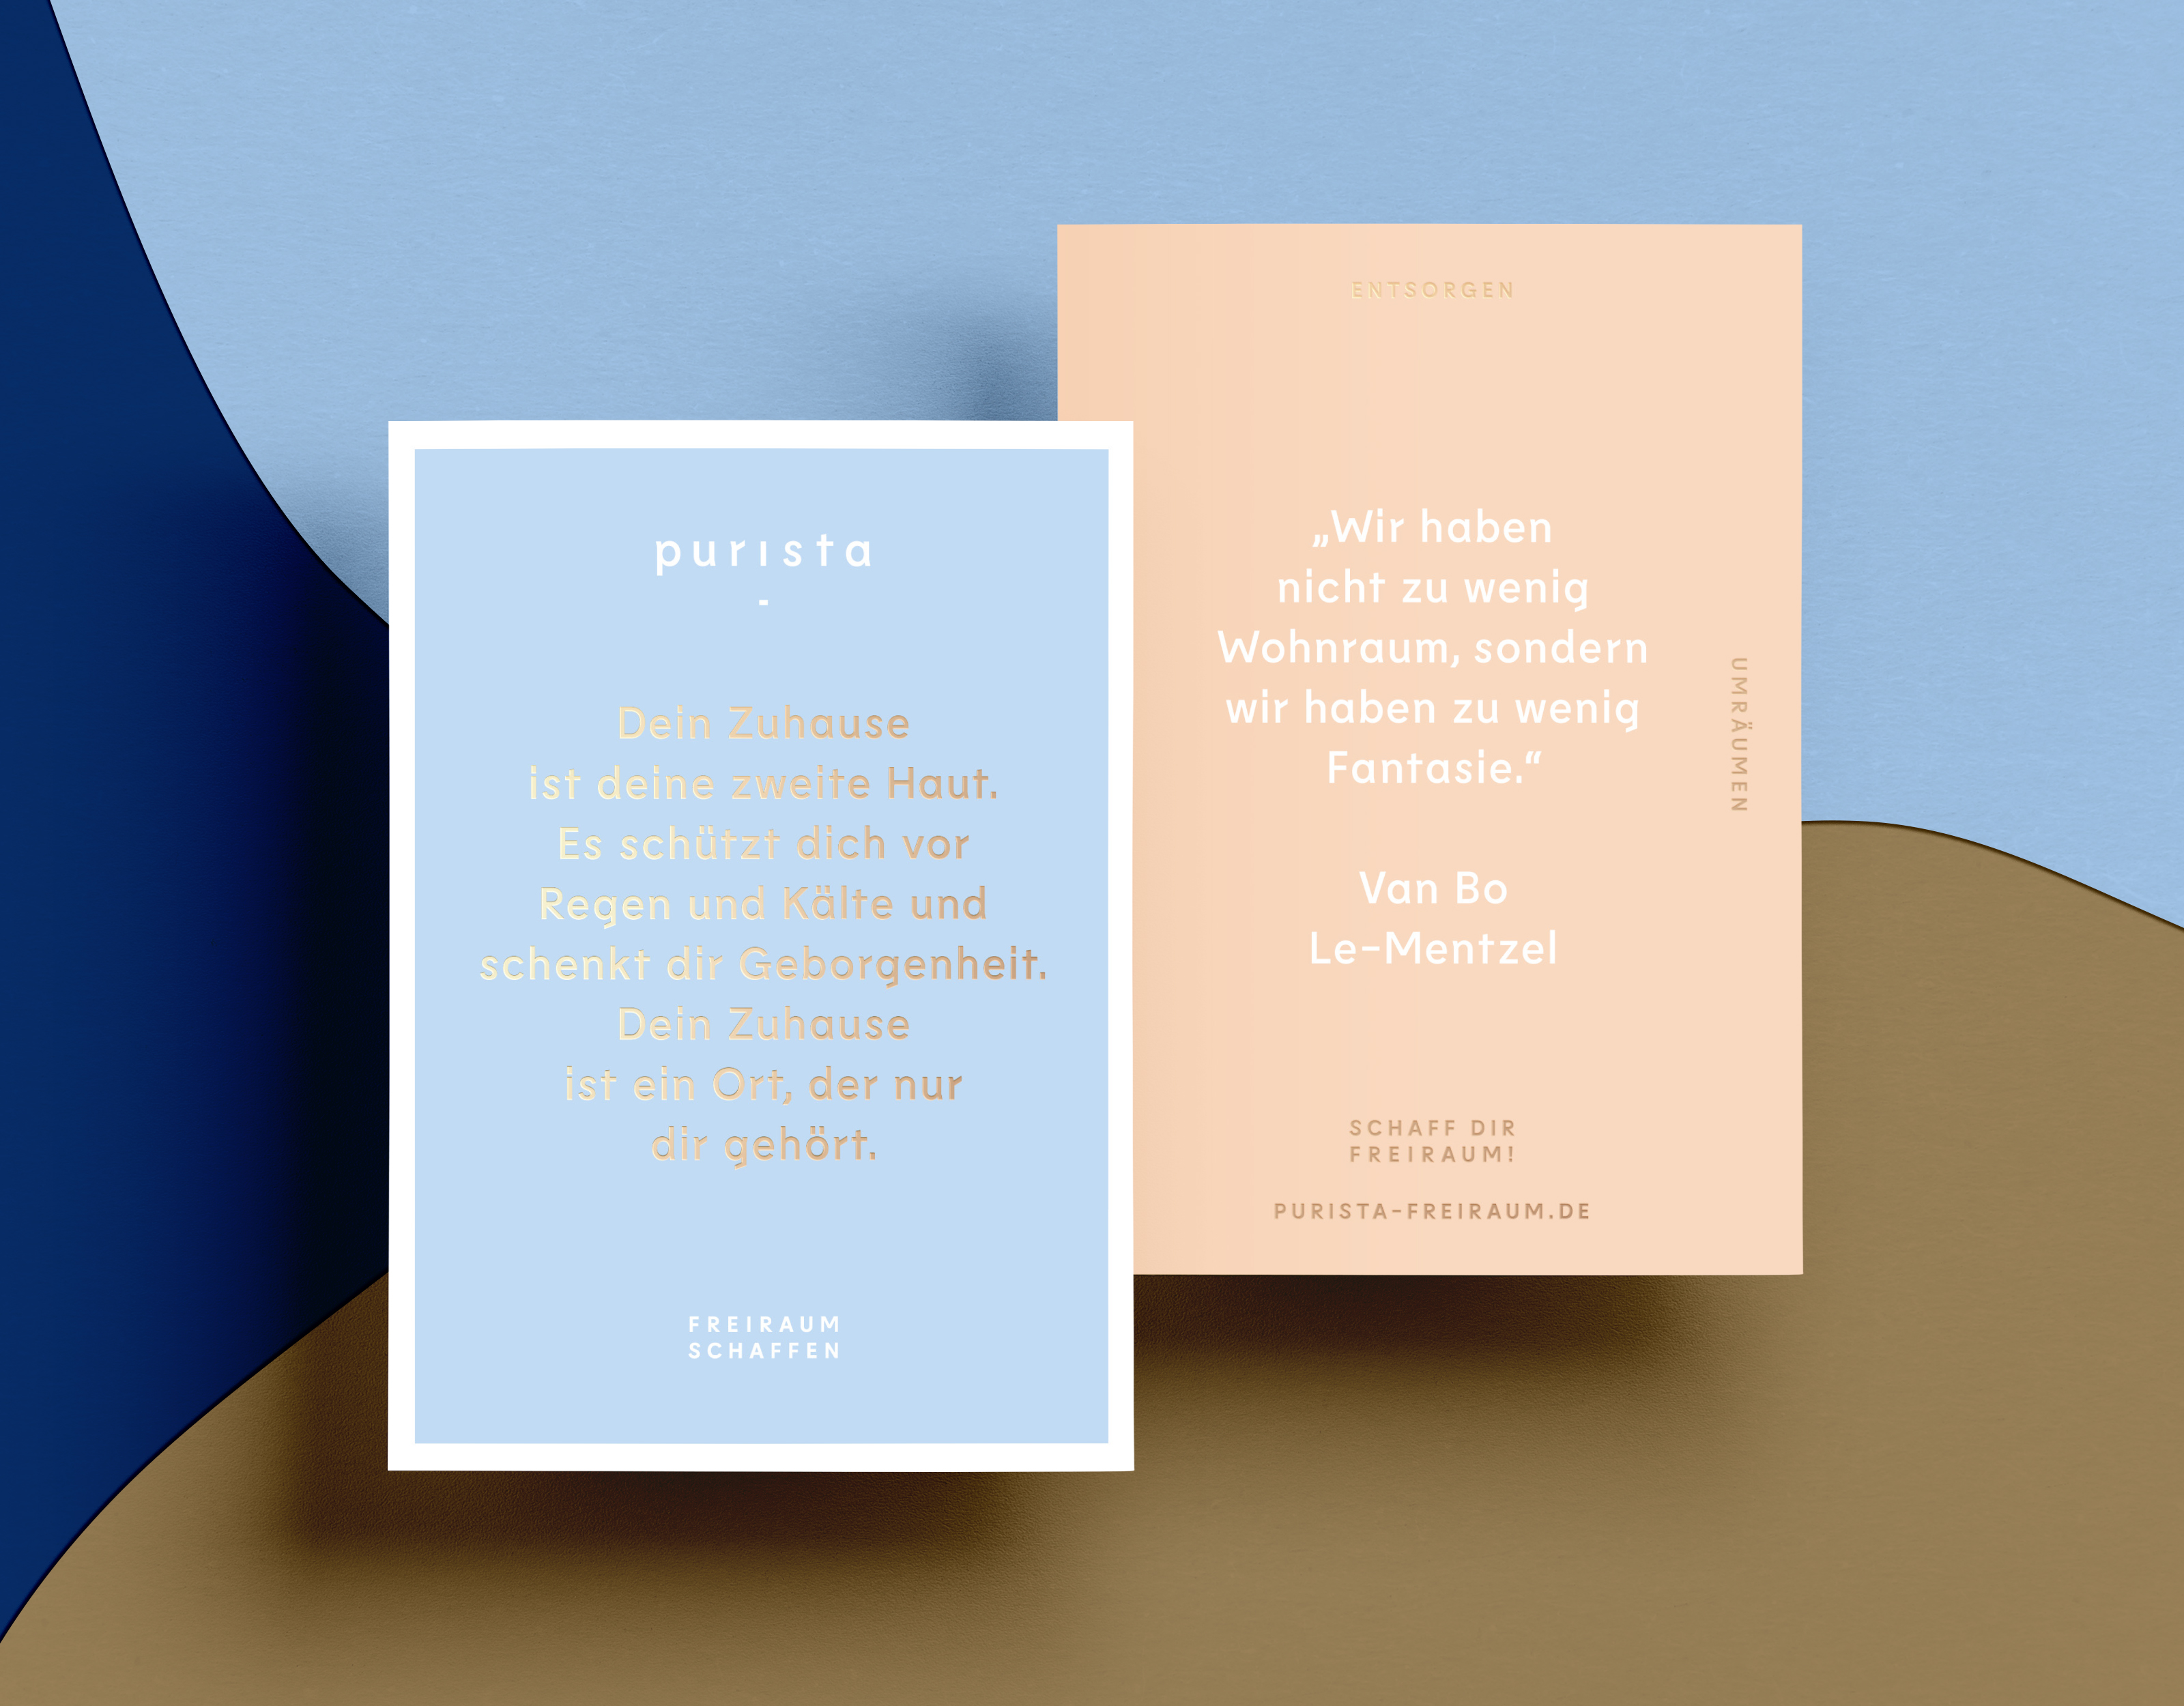 purista – freiraum schaffen